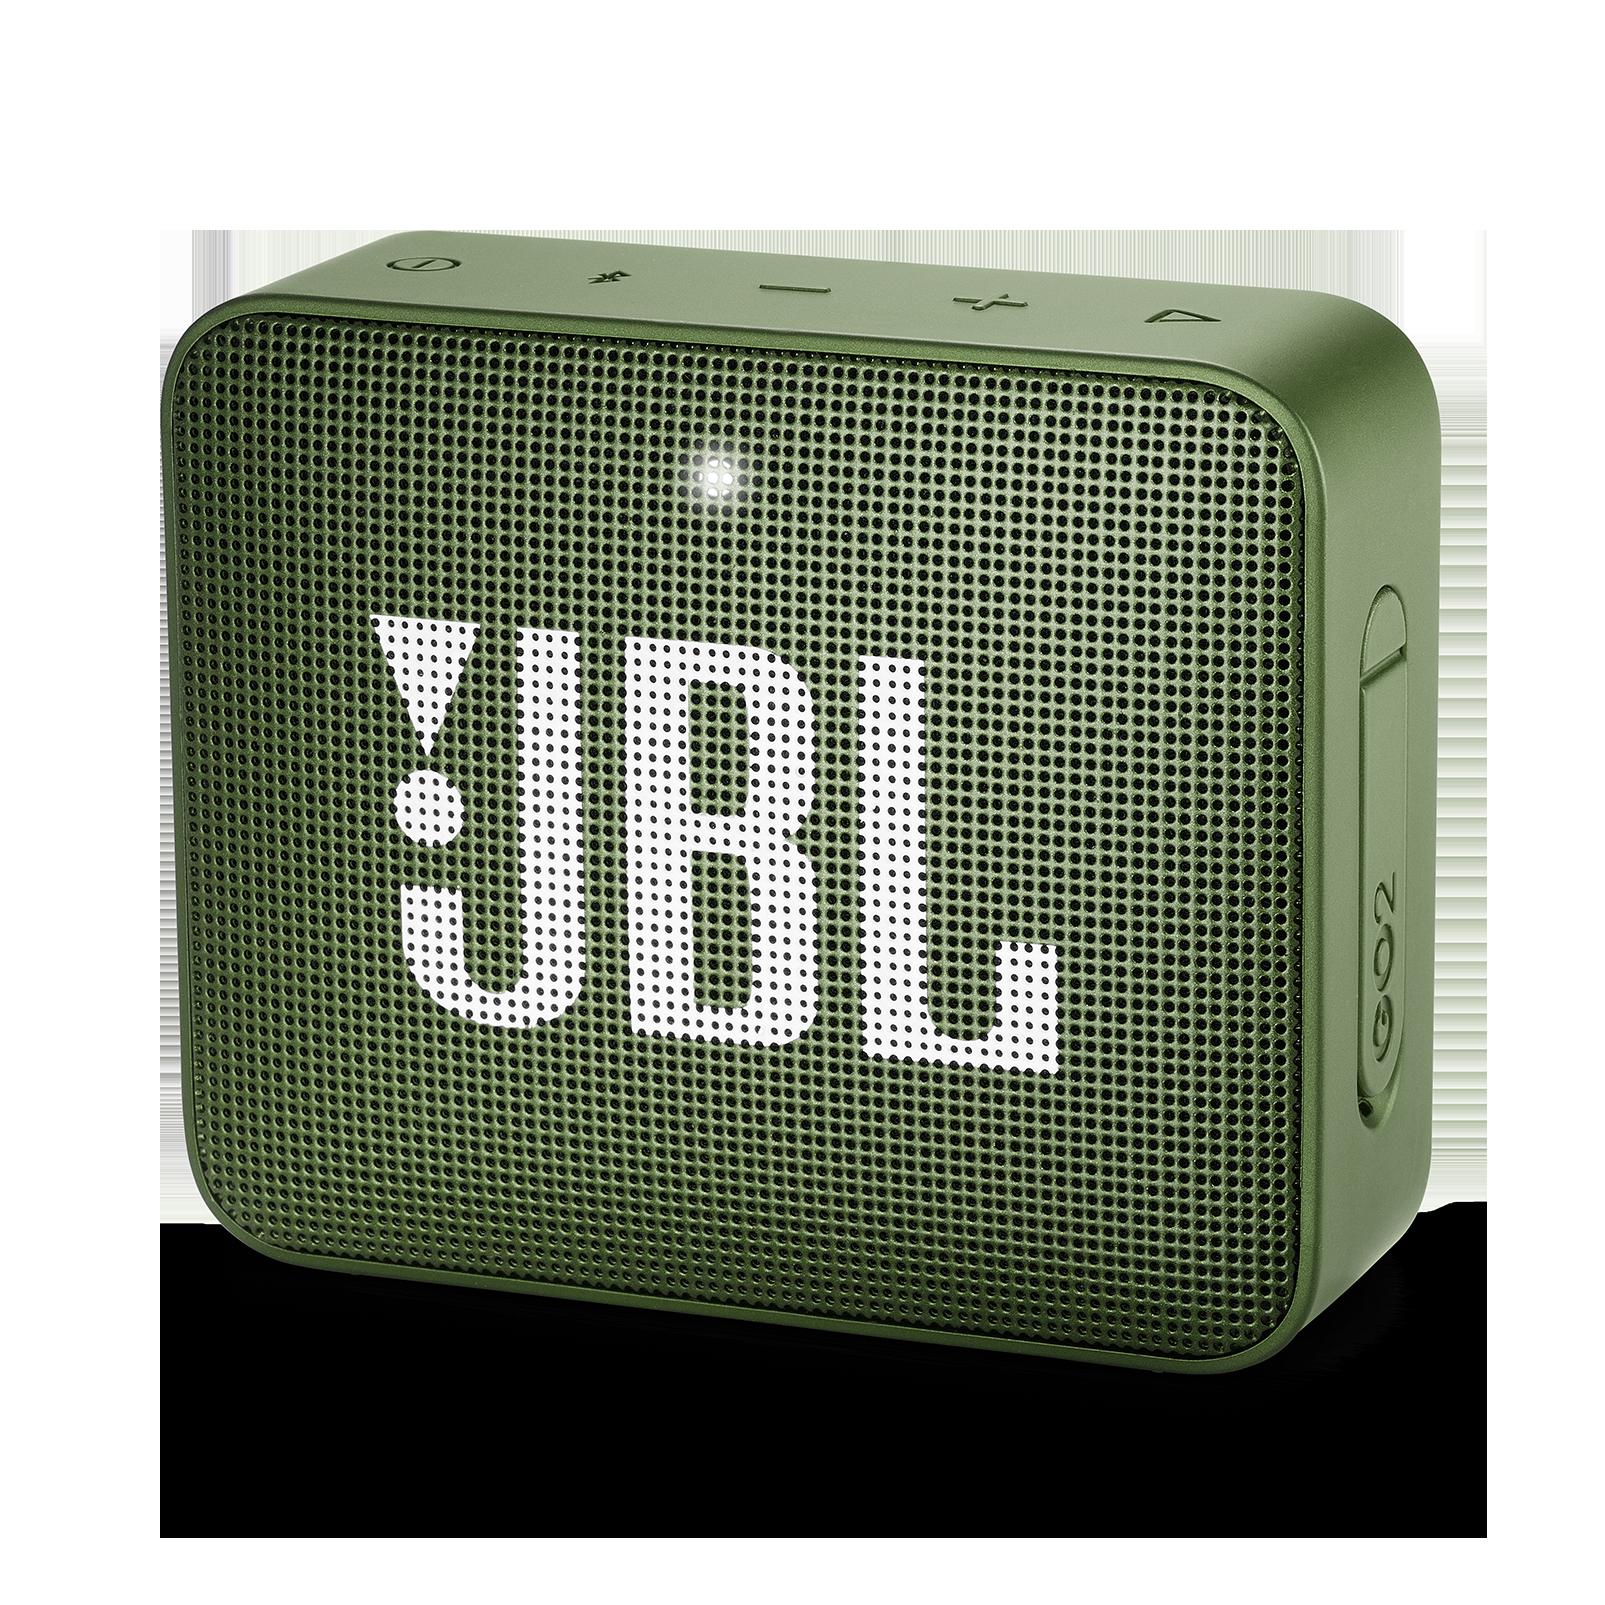 JBL GO 2 - Moss Green - Portable Bluetooth speaker - Hero